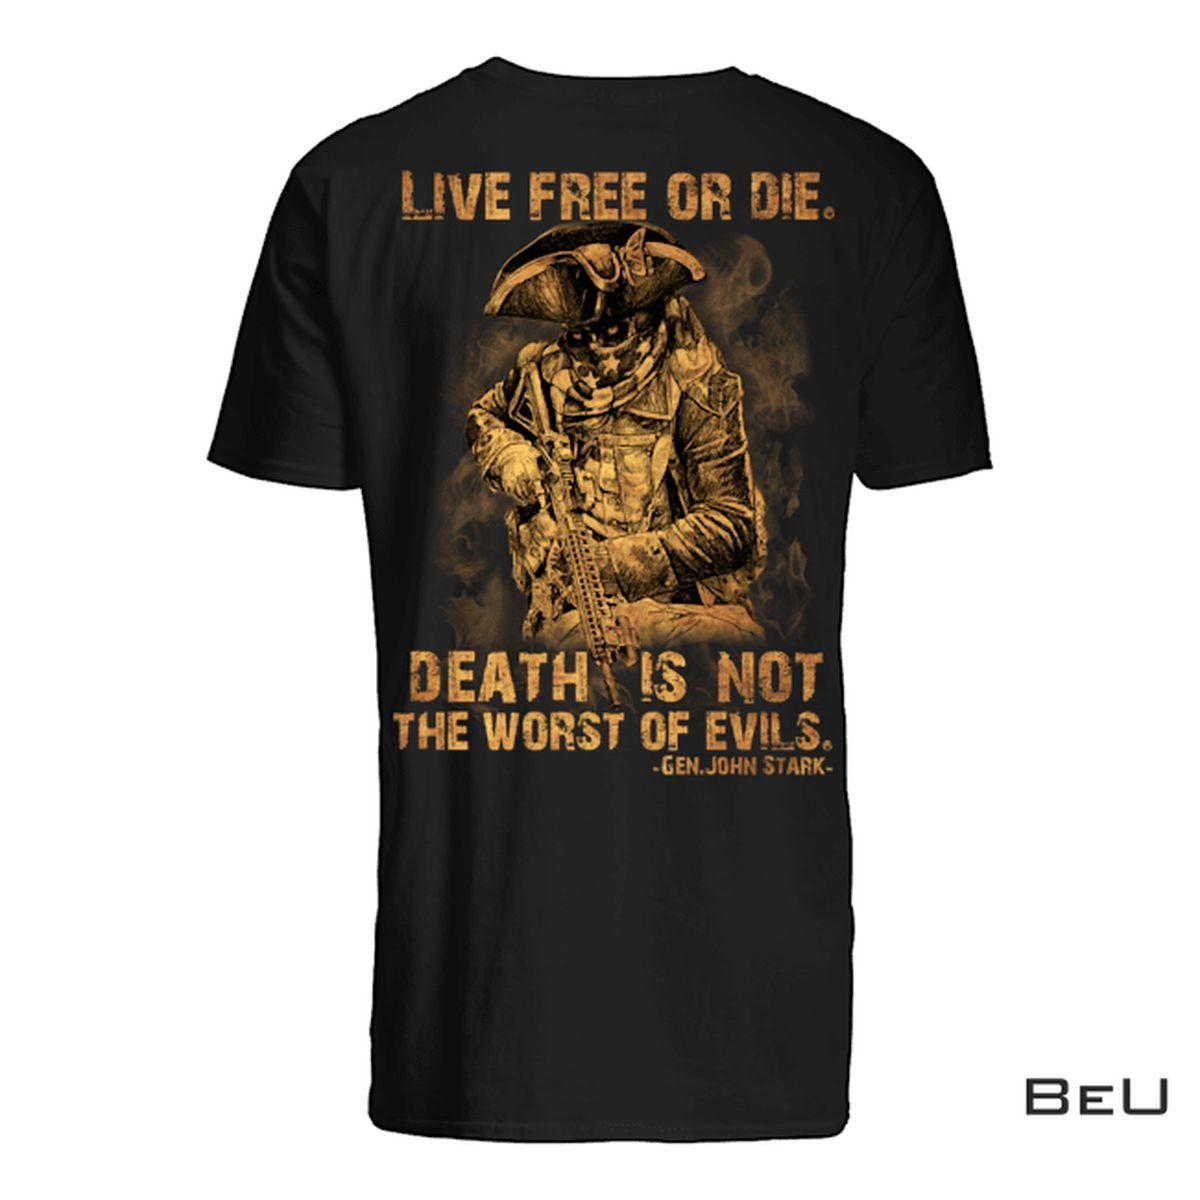 Live Free Or Die Death Is Not The Worst Of Evils Shirt, hoodie, tank top